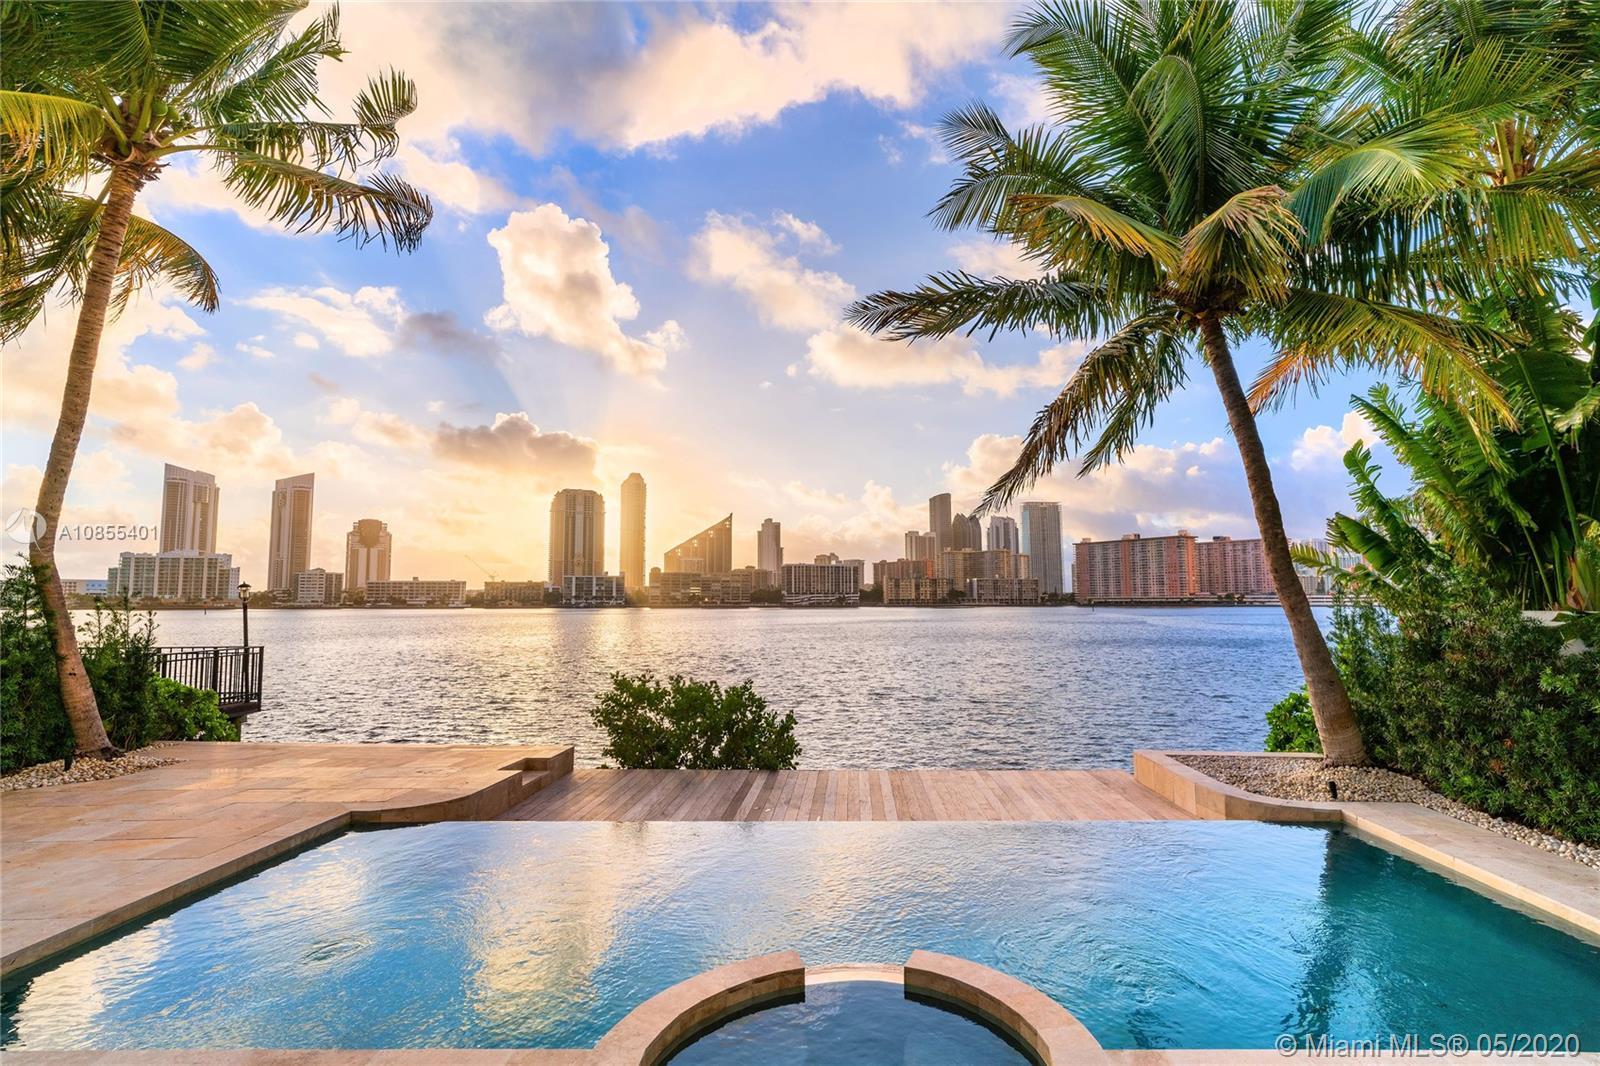 4032 Island Estates Dr Property Photo - Aventura, FL real estate listing